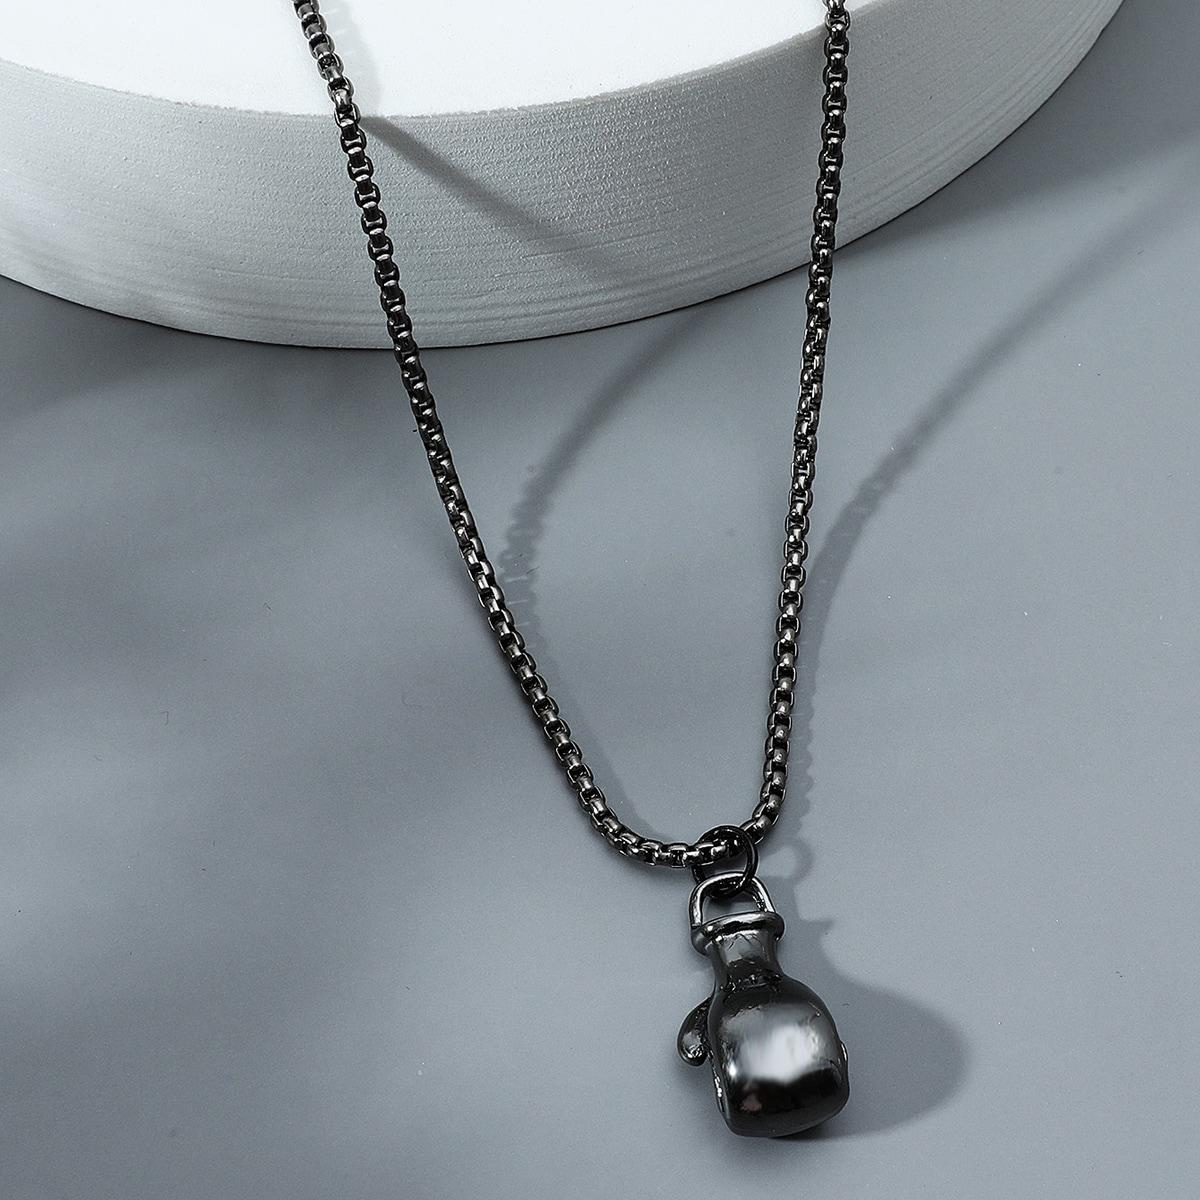 Ожерелье с кулаком для мужчин